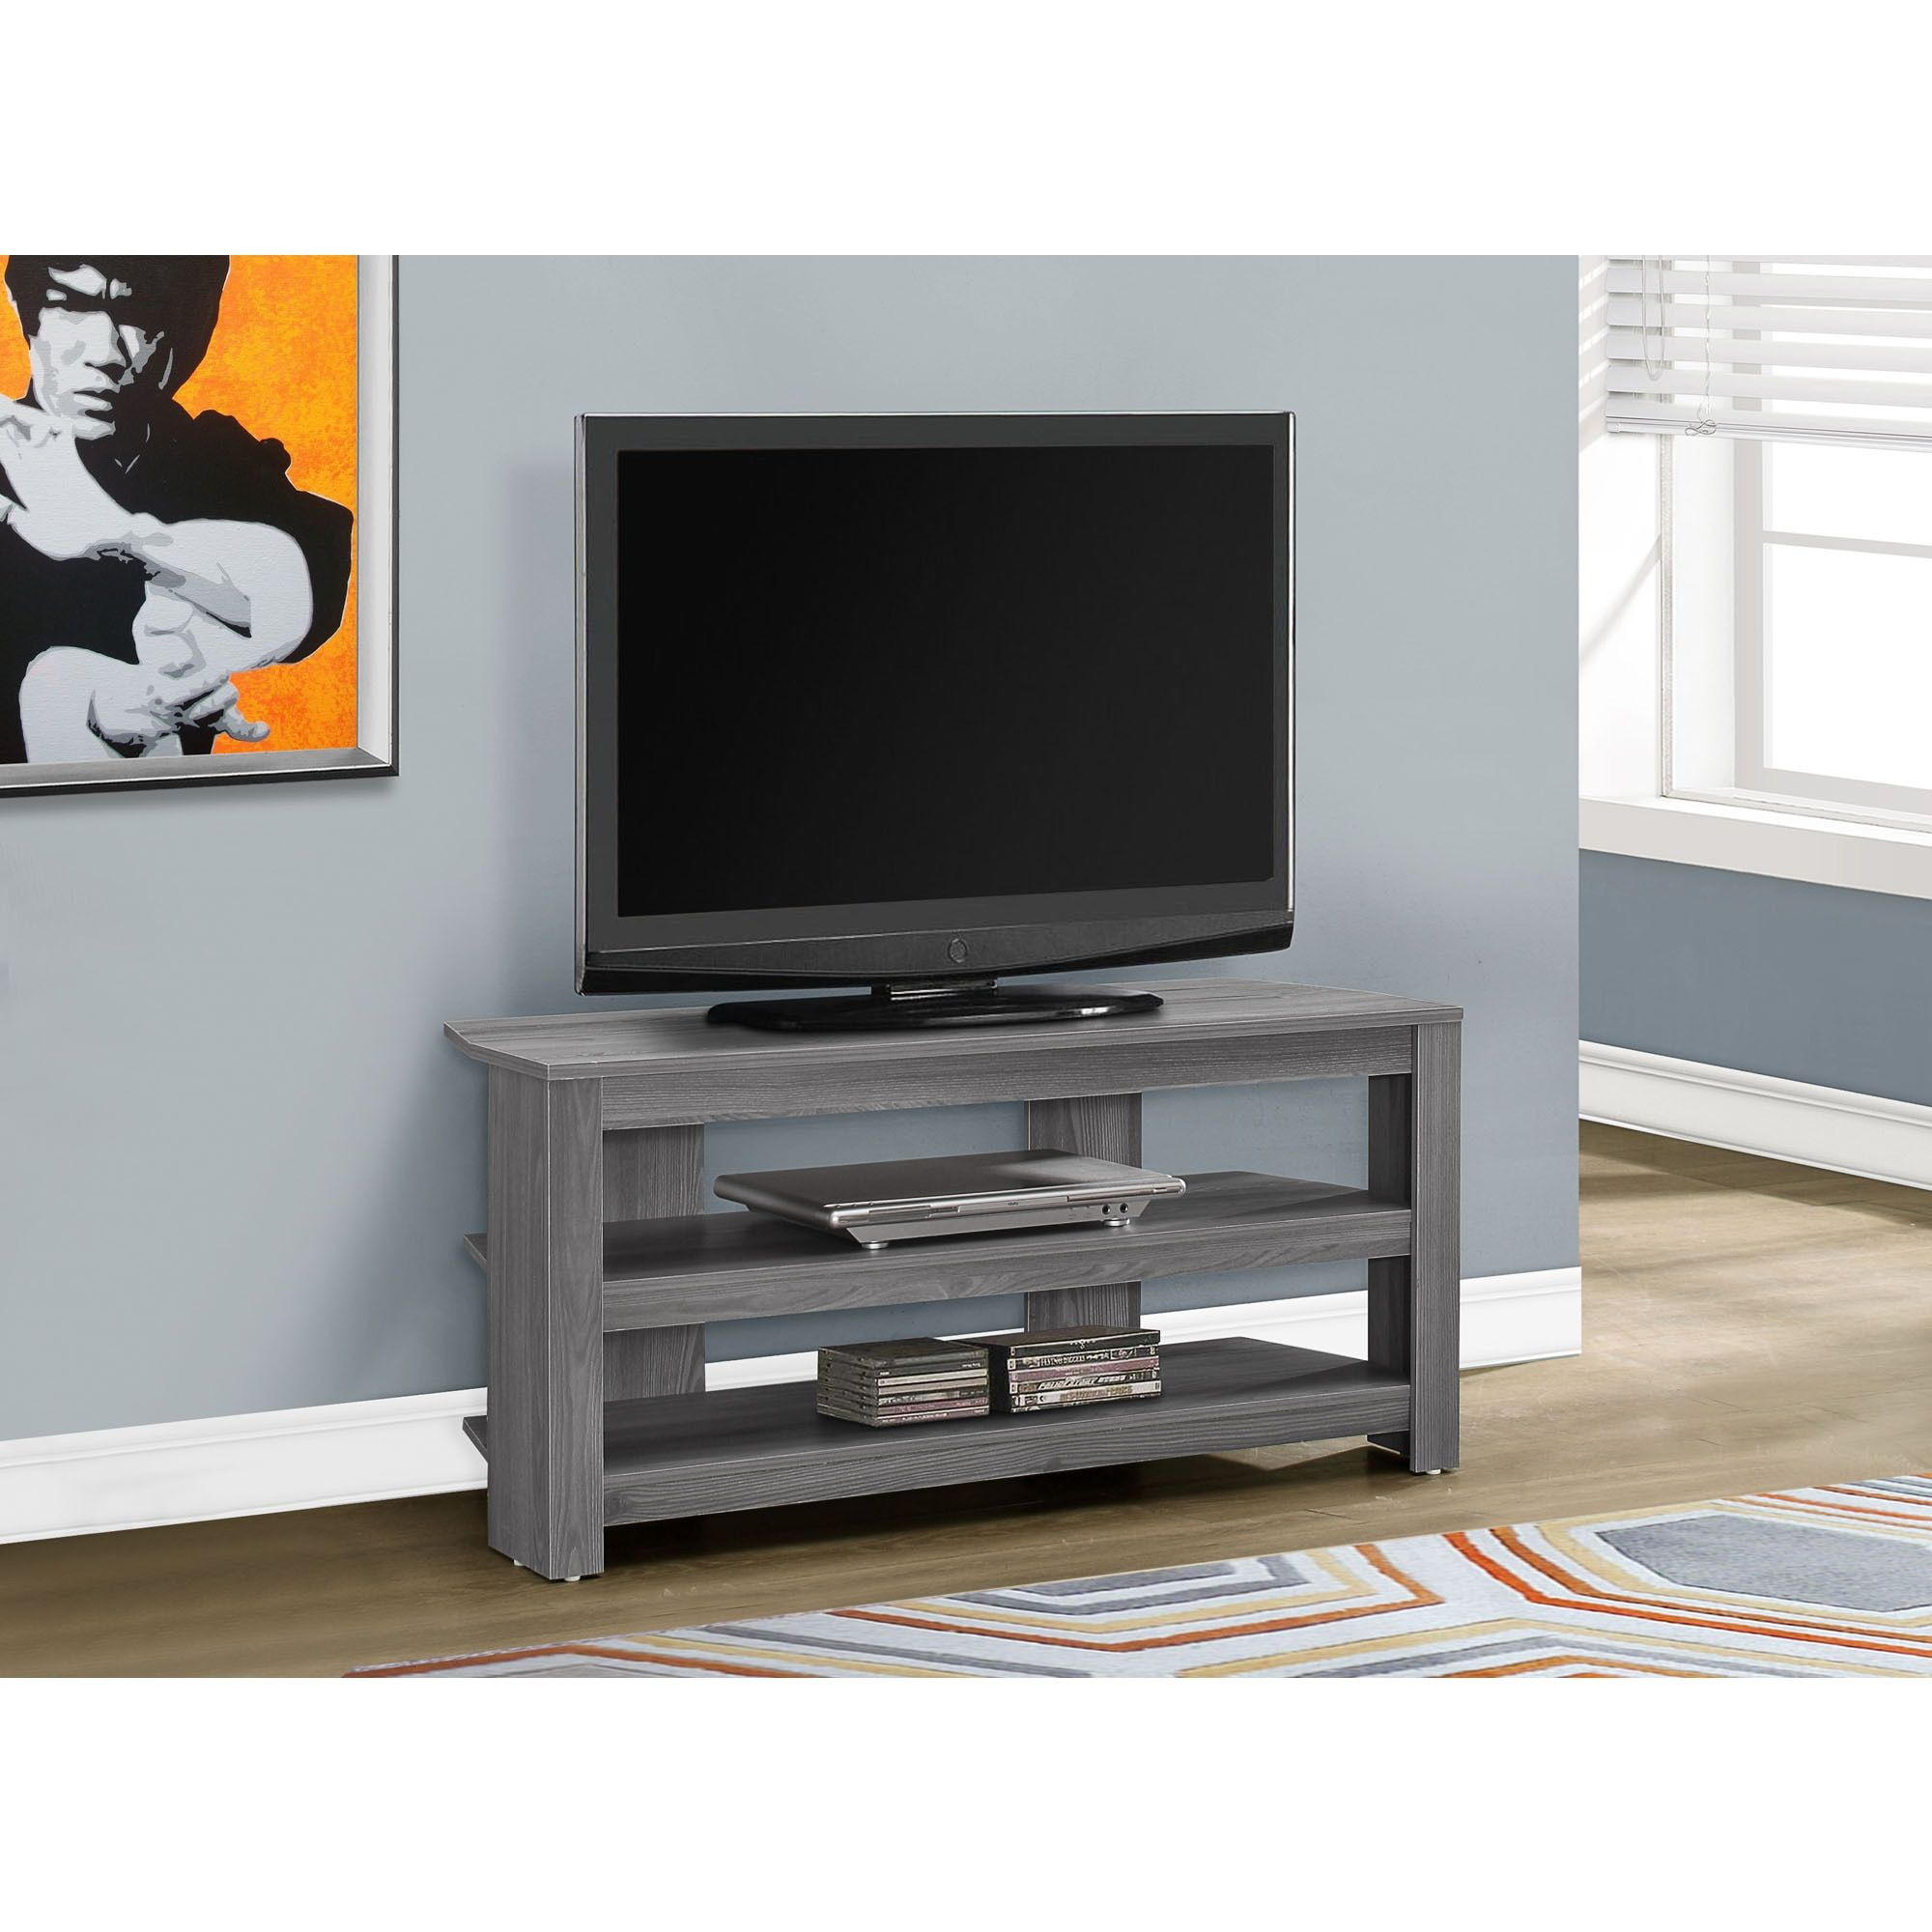 Tv Stand 42 L Grey Corner Overstock Com Shopping The Best Deals